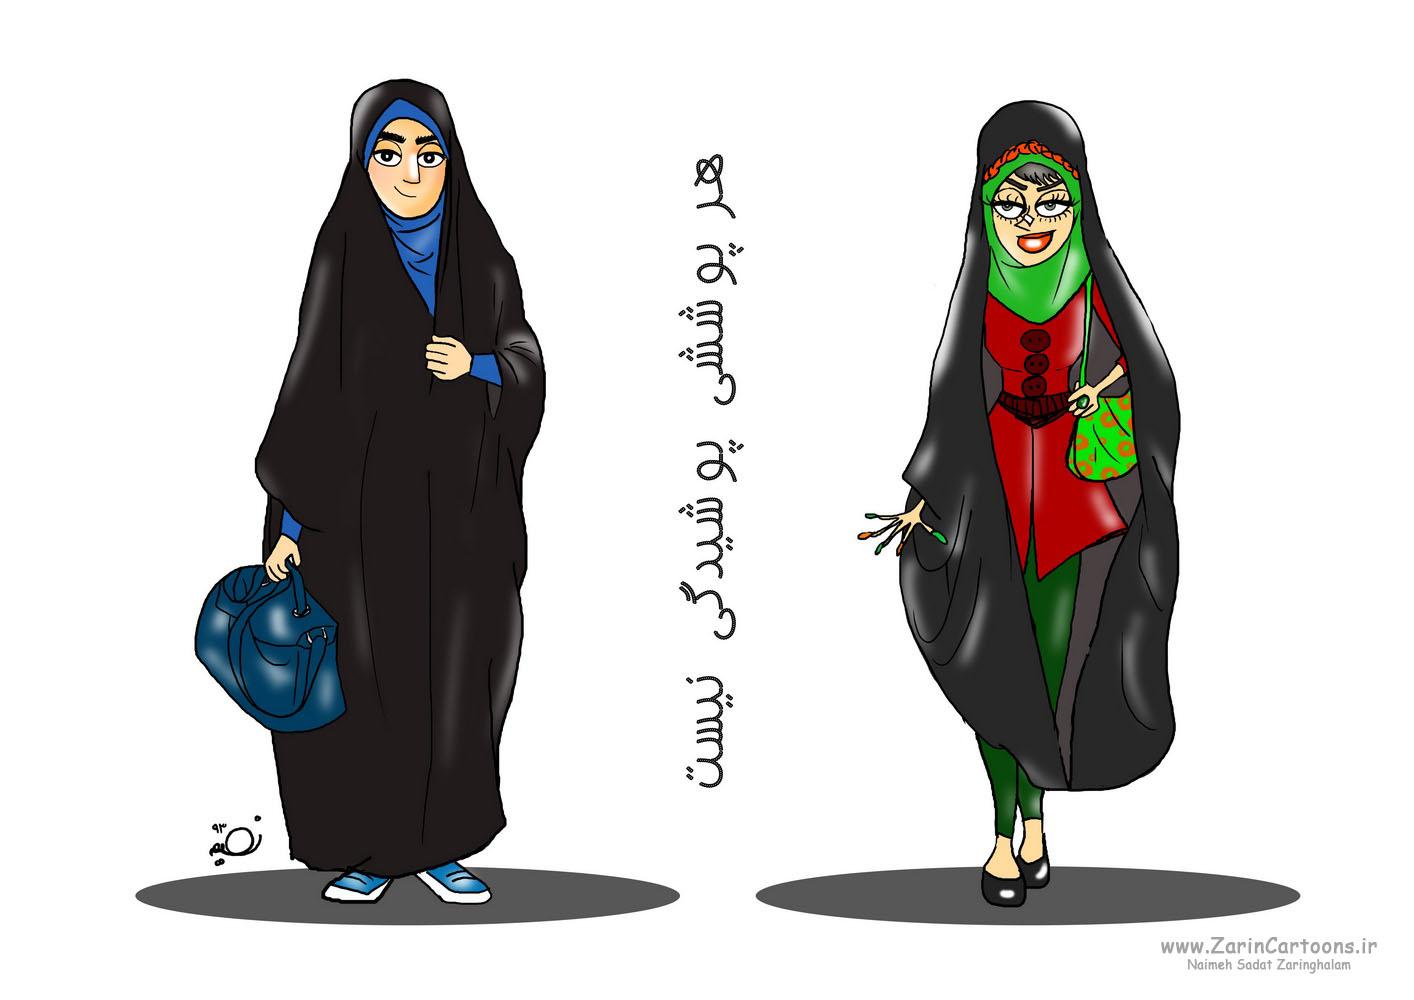 کاریکاتور حجاب .2 سری جدید کاریکاتور با موضوع حجاب سری جدید کاریکاتور با موضوع حجاب